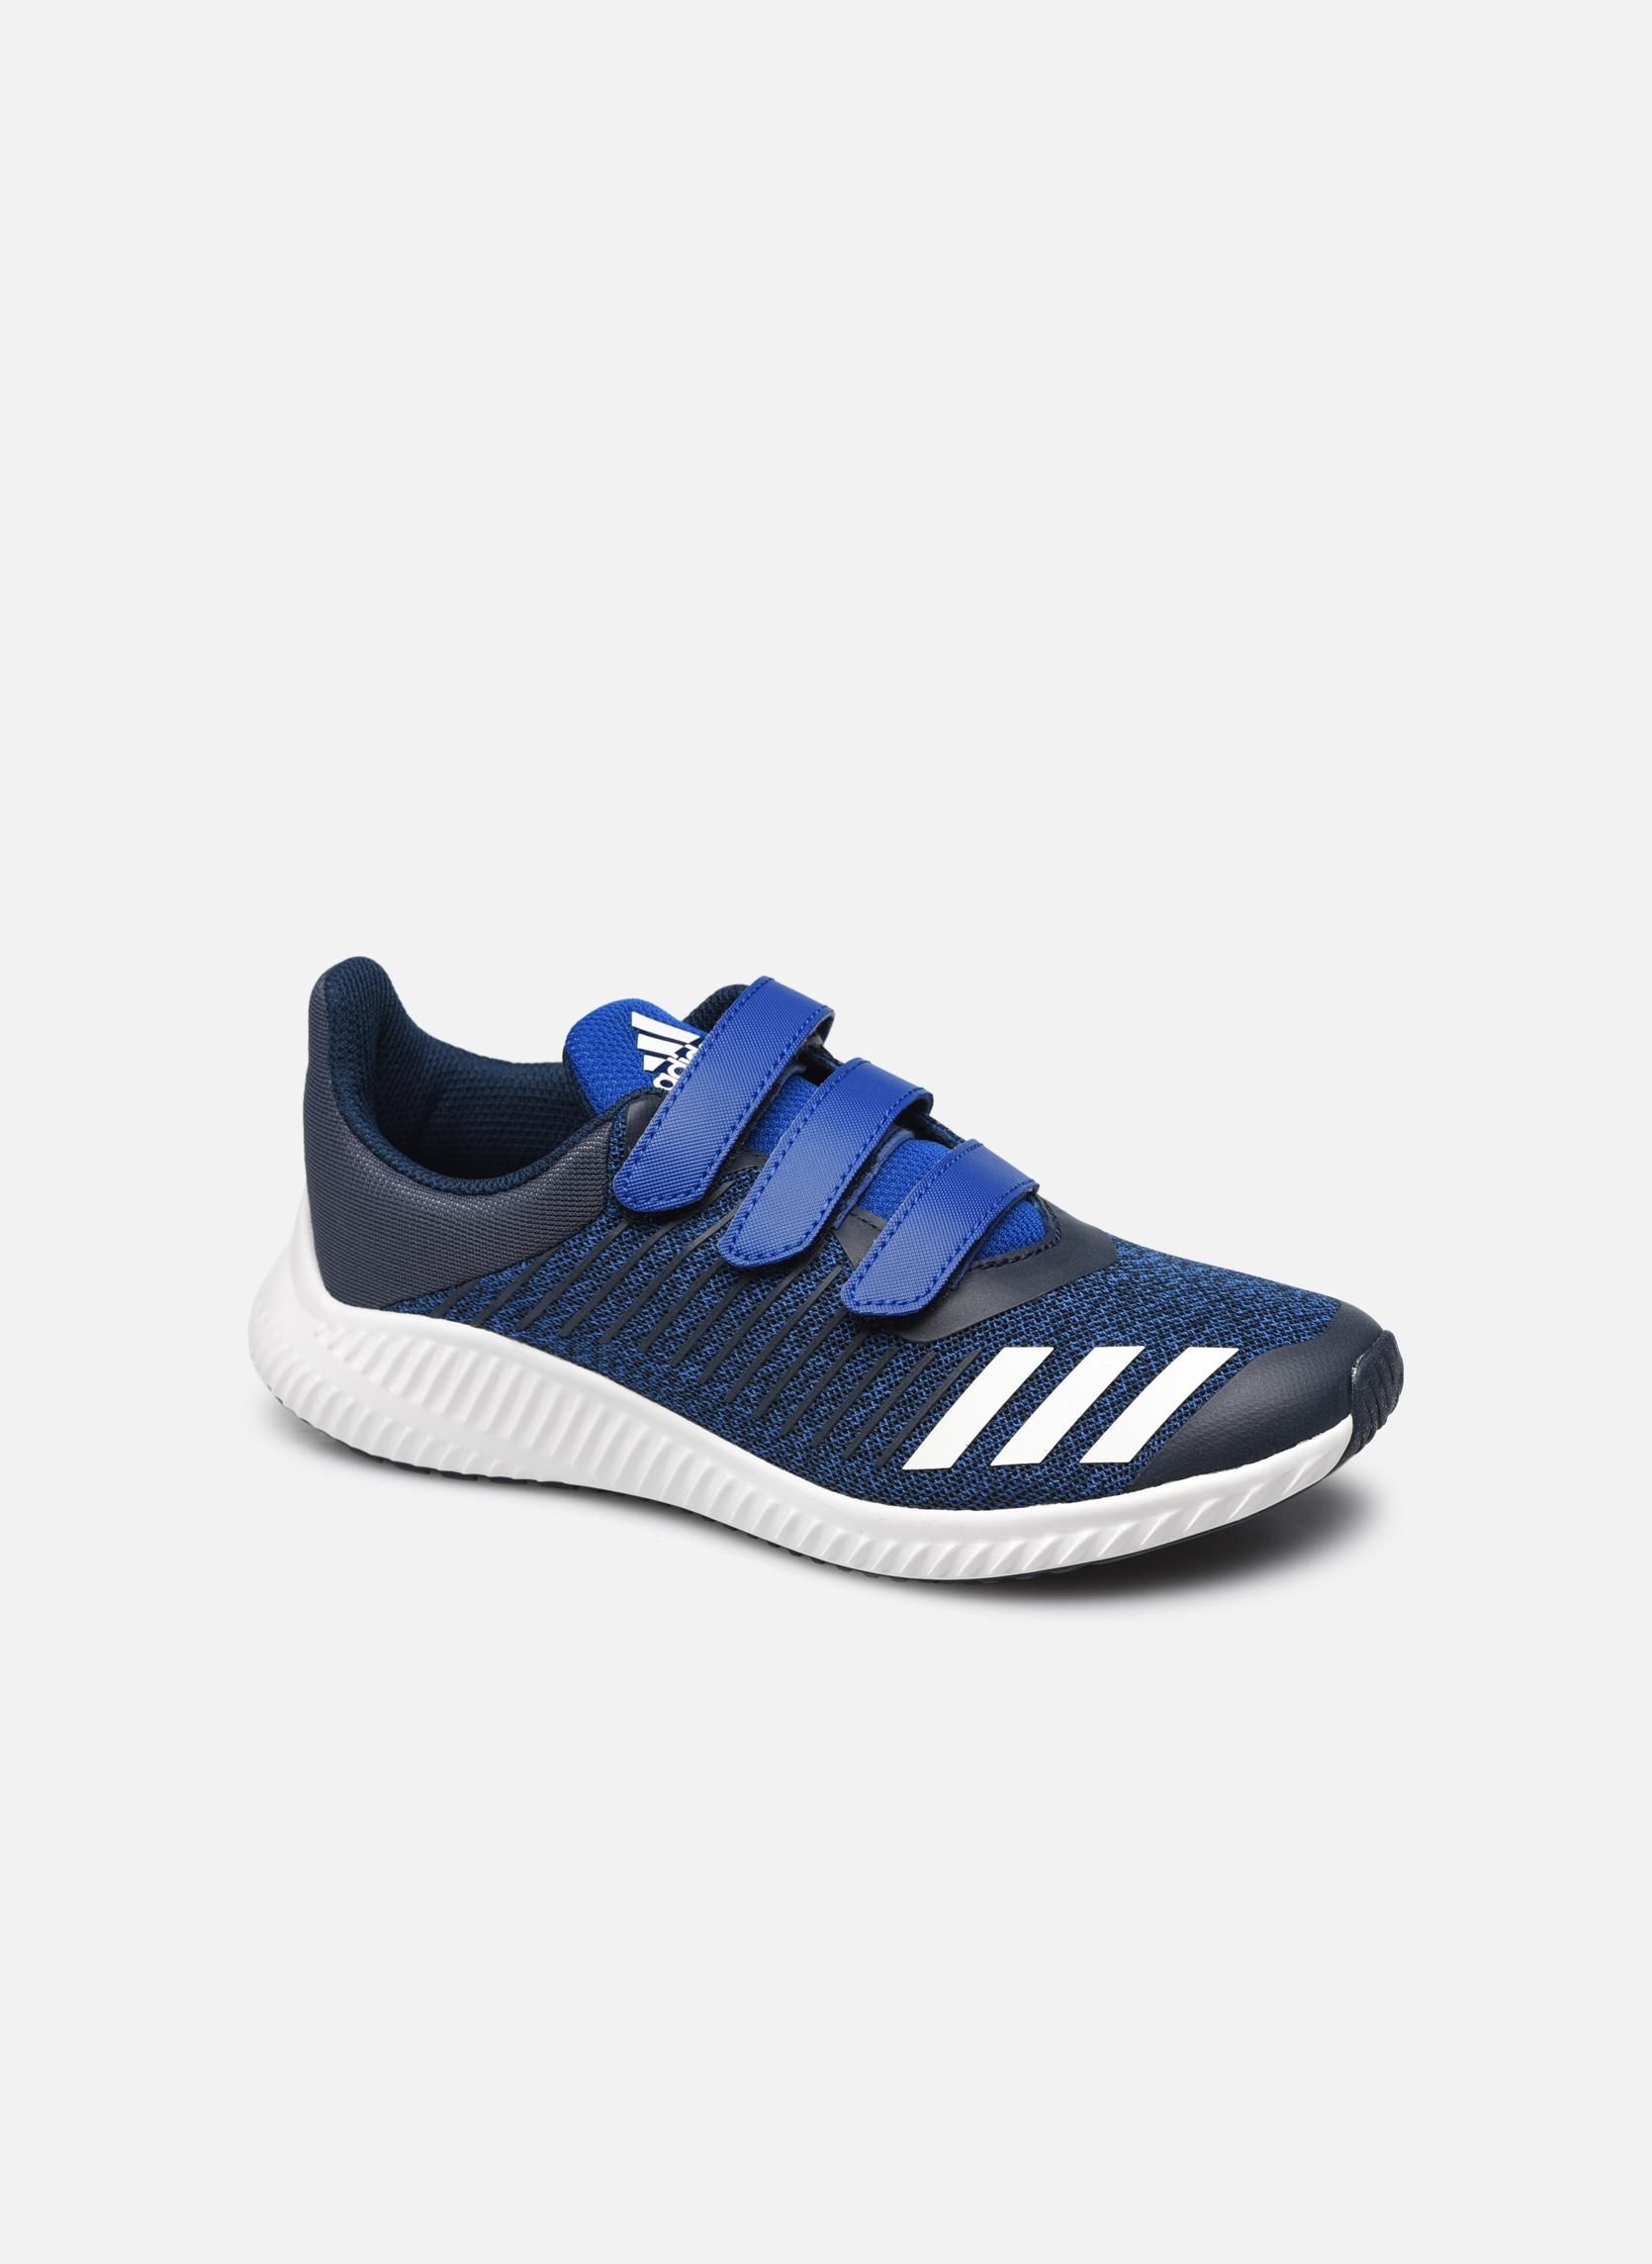 Adidas Performance Fortarun Cf K